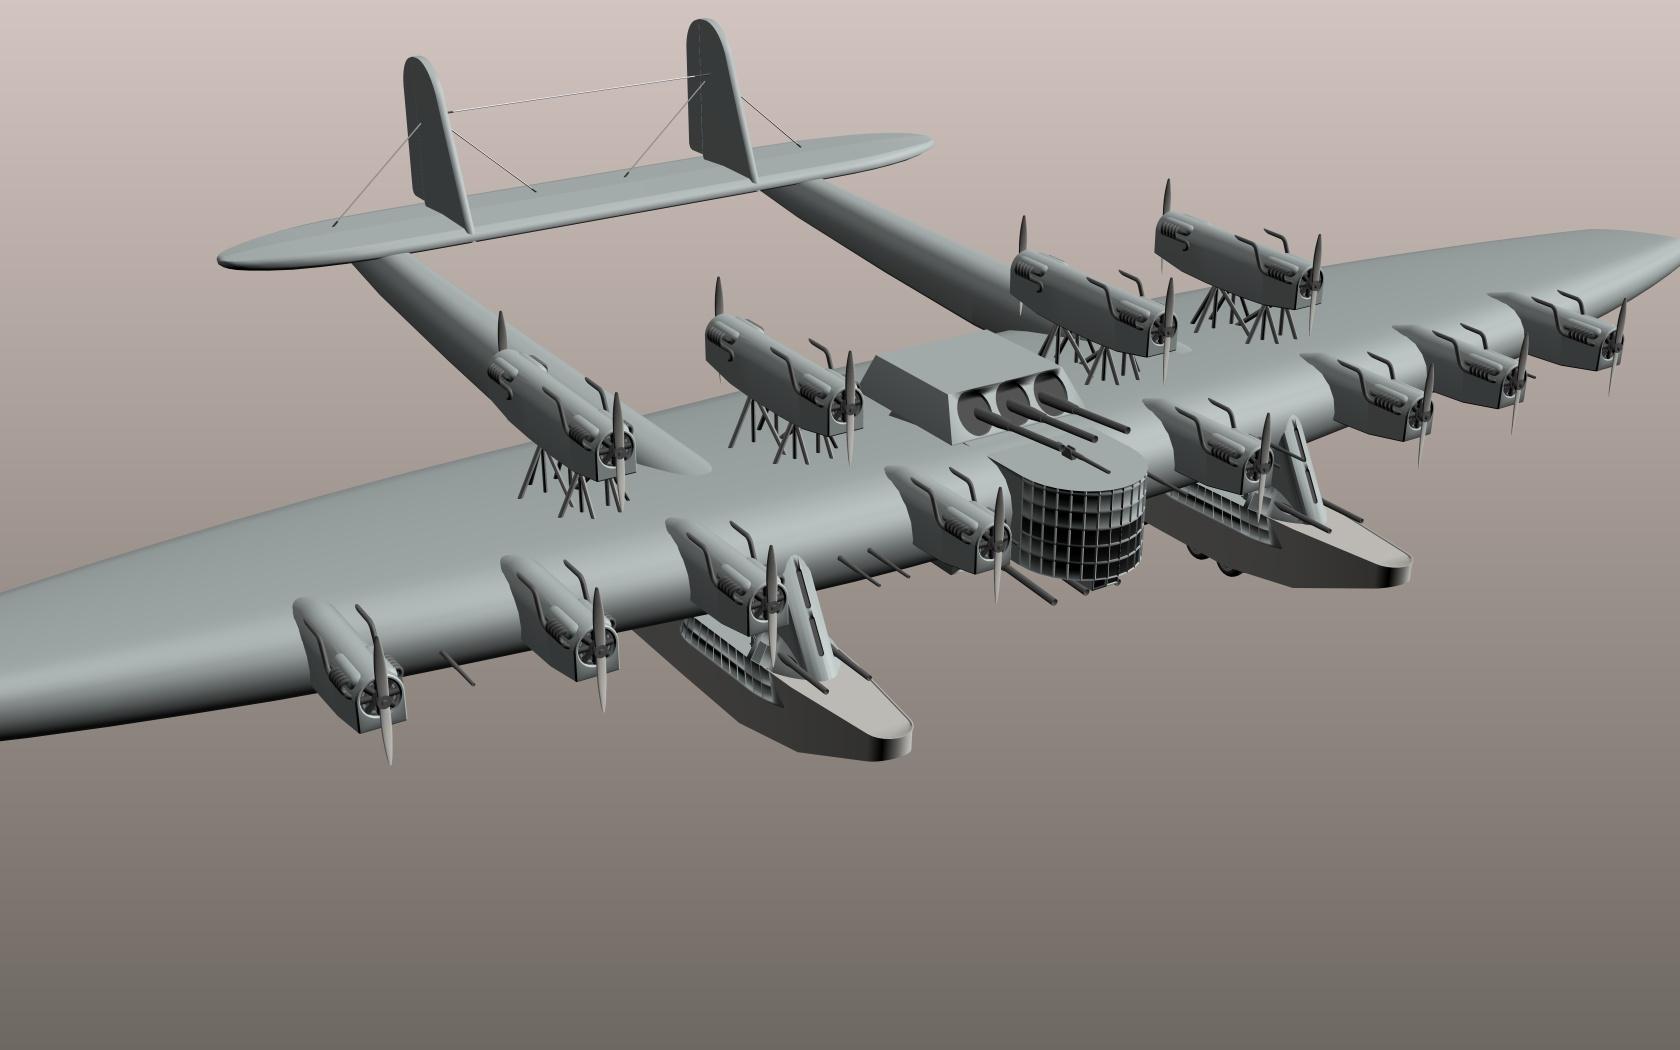 Ka 17 Quot Flying Tank Quot Image Vitriol 3d Mod Db